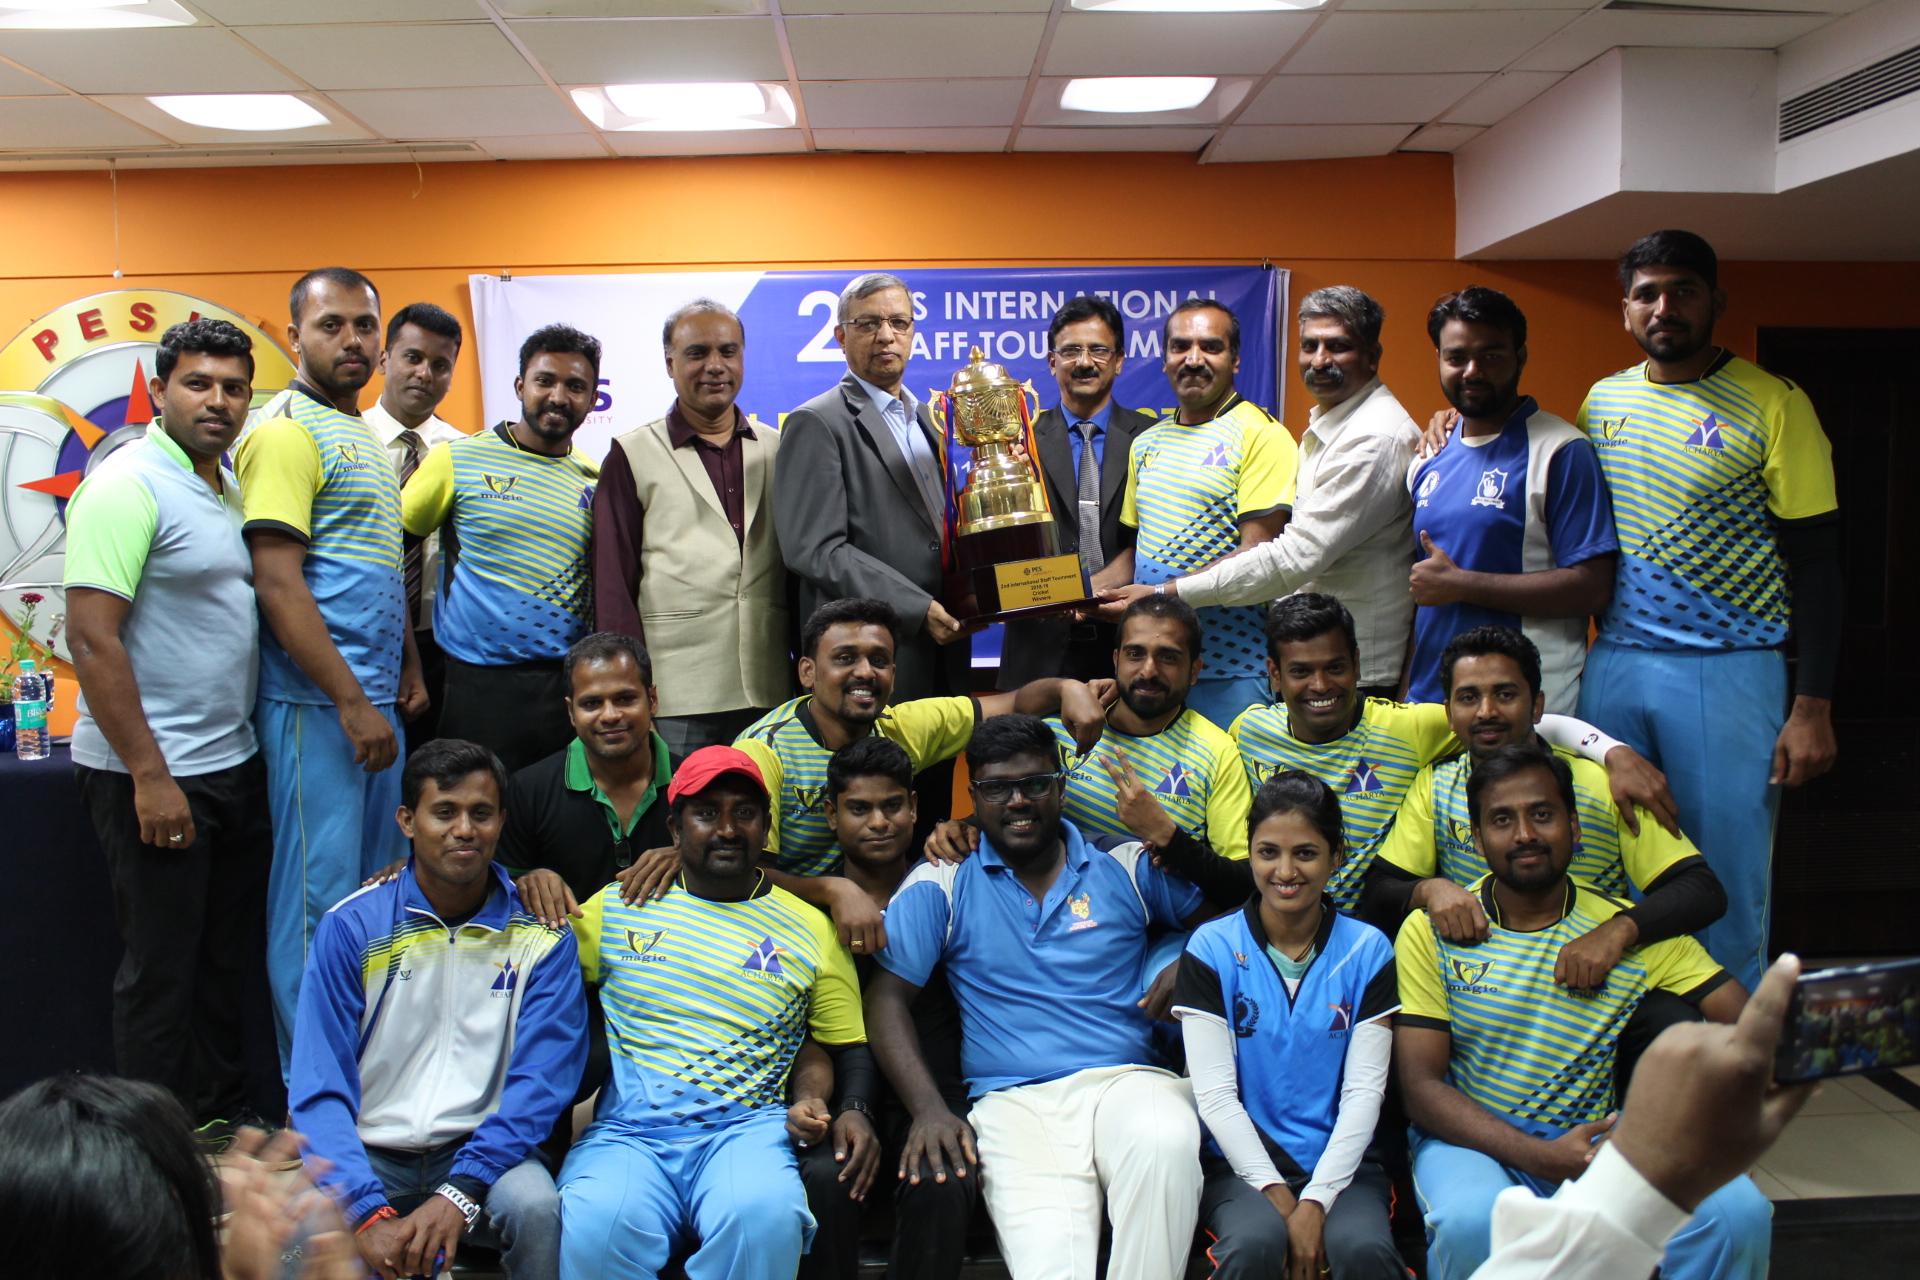 International staff tournament